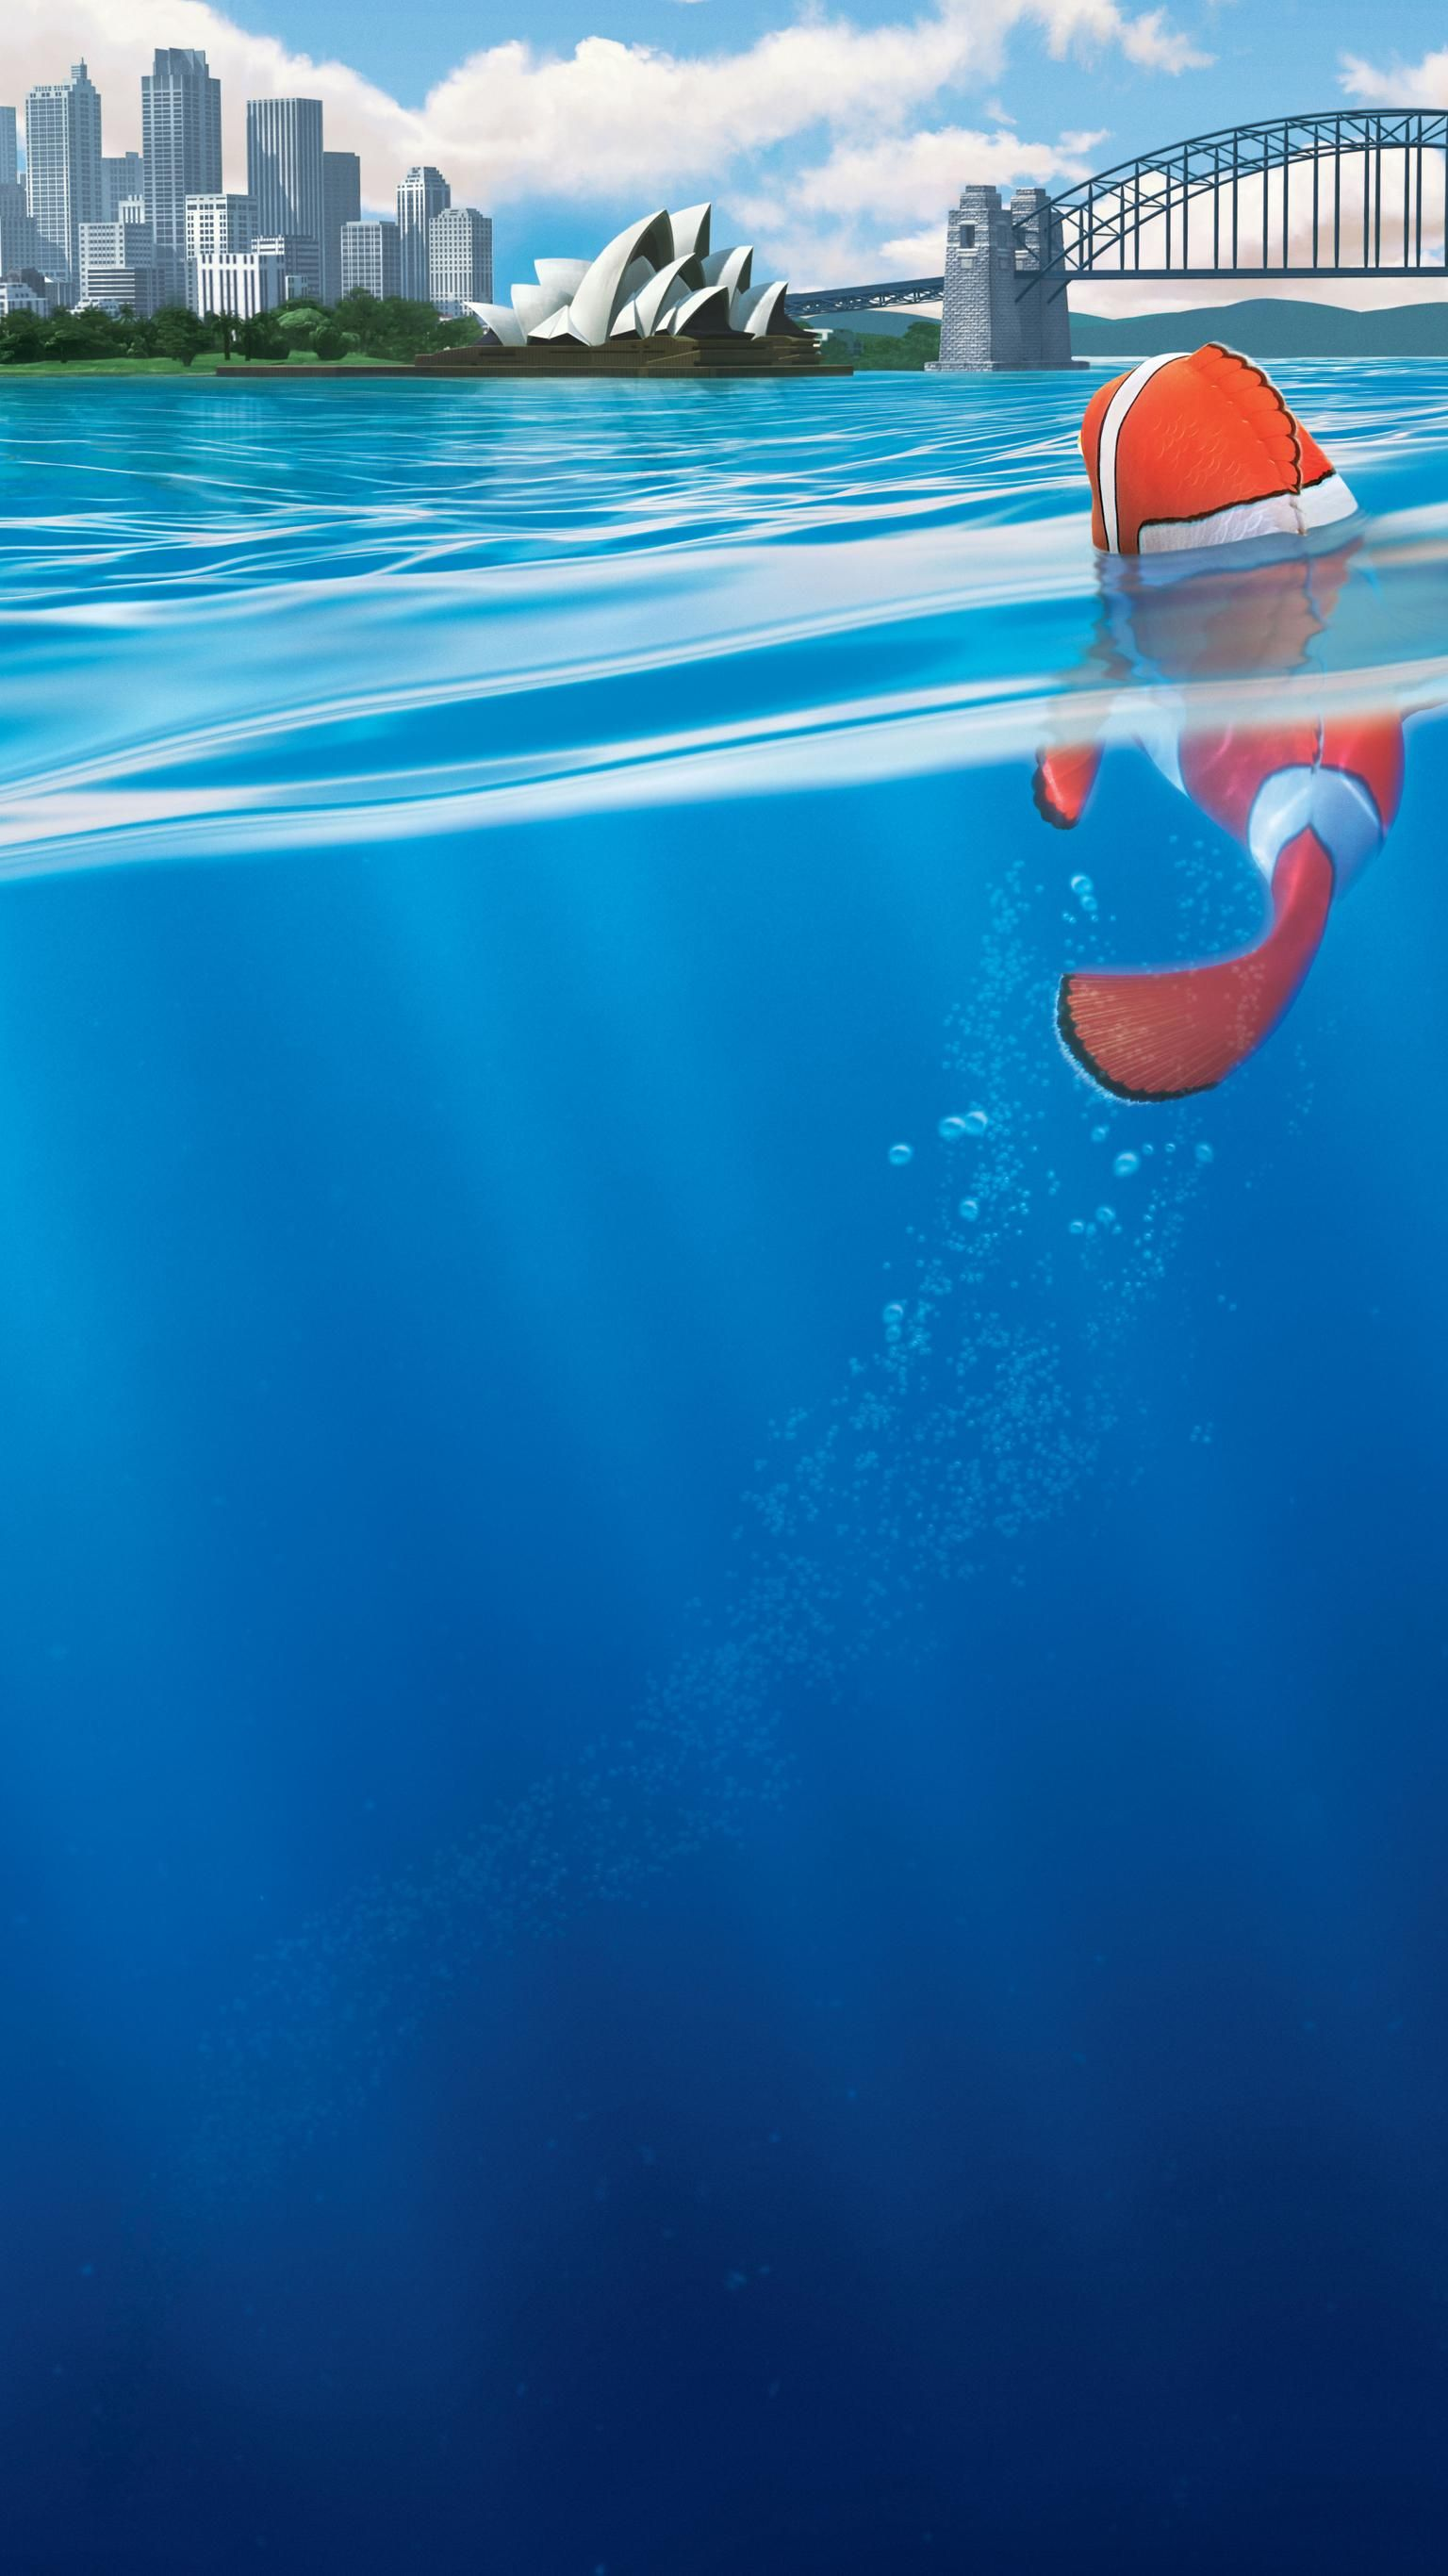 Finding Nemo (2003) Phone Wallpaper   Moviemania